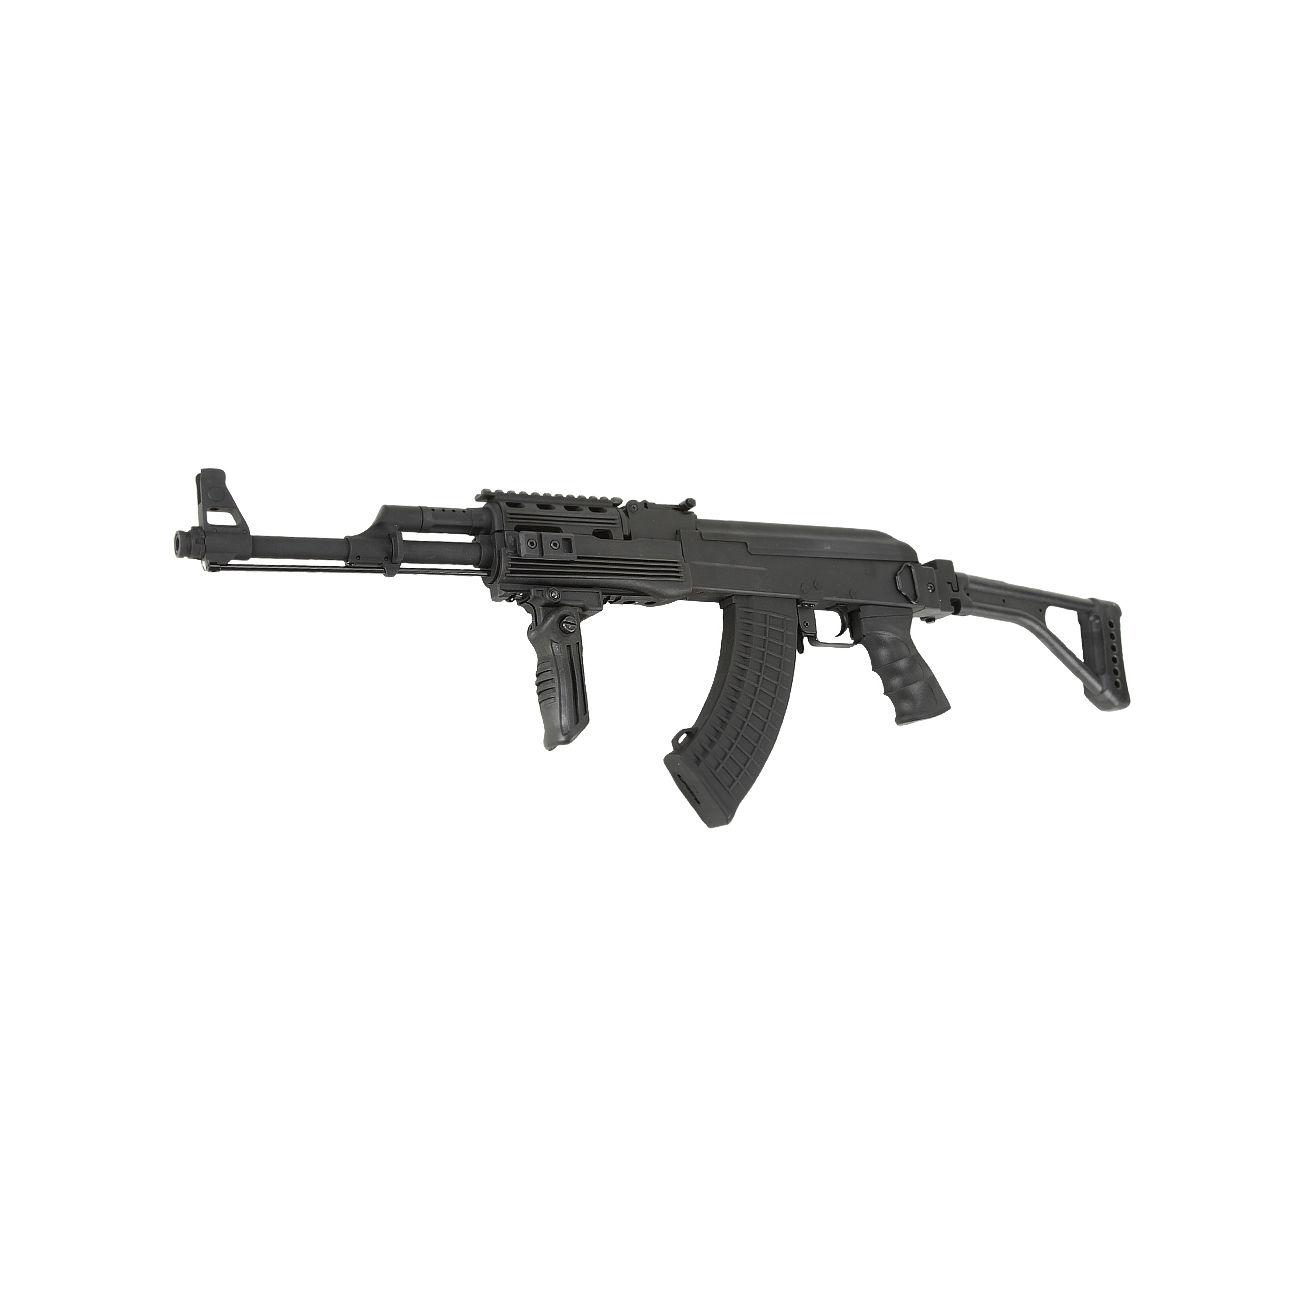 cm ak47 tactical mit klappschaft komplettset s aeg 6mm bb schwarz kotte zeller. Black Bedroom Furniture Sets. Home Design Ideas